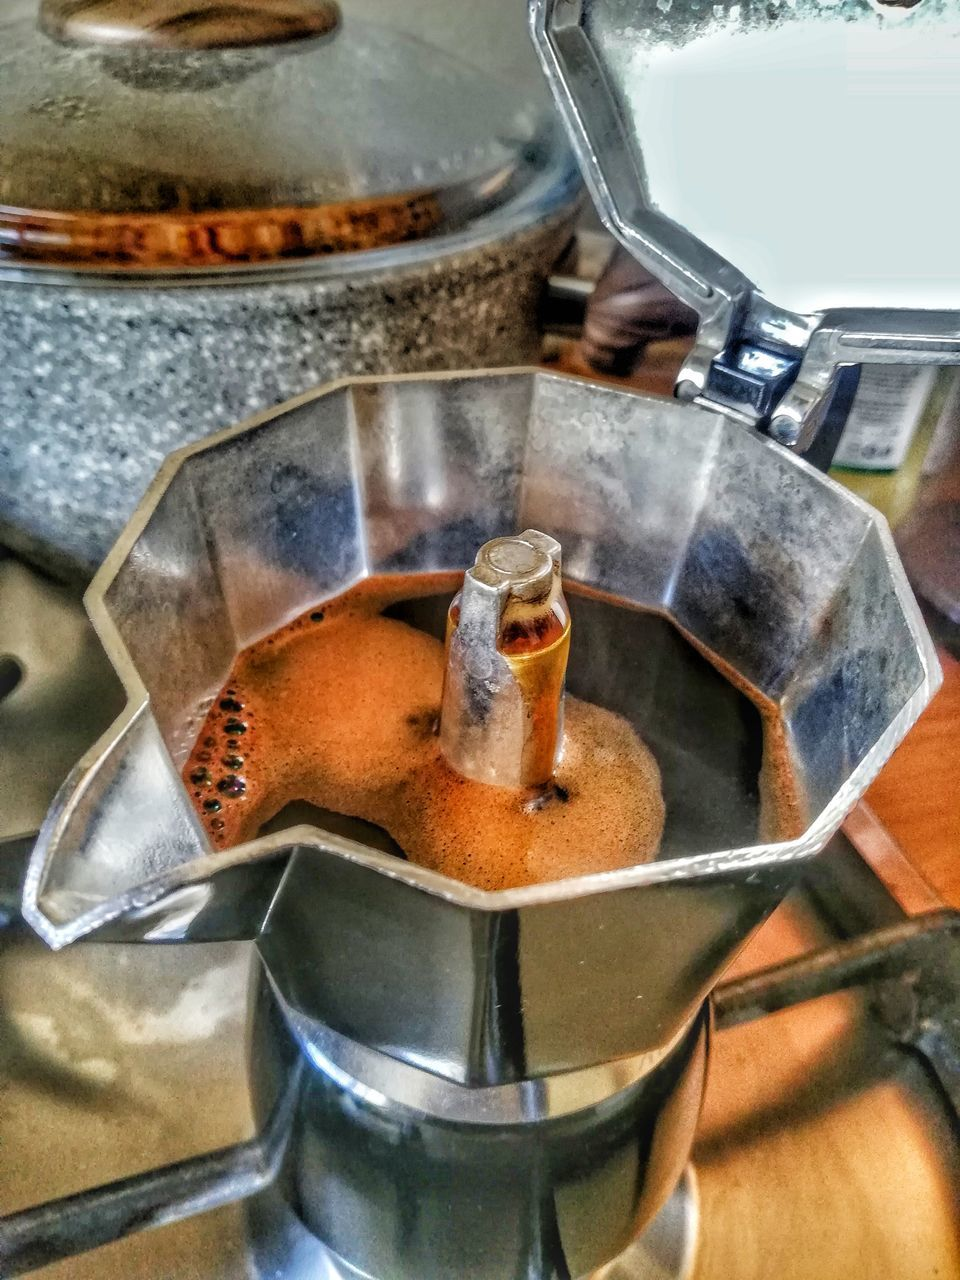 HIGH ANGLE VIEW OF COFFEE WITH TEA